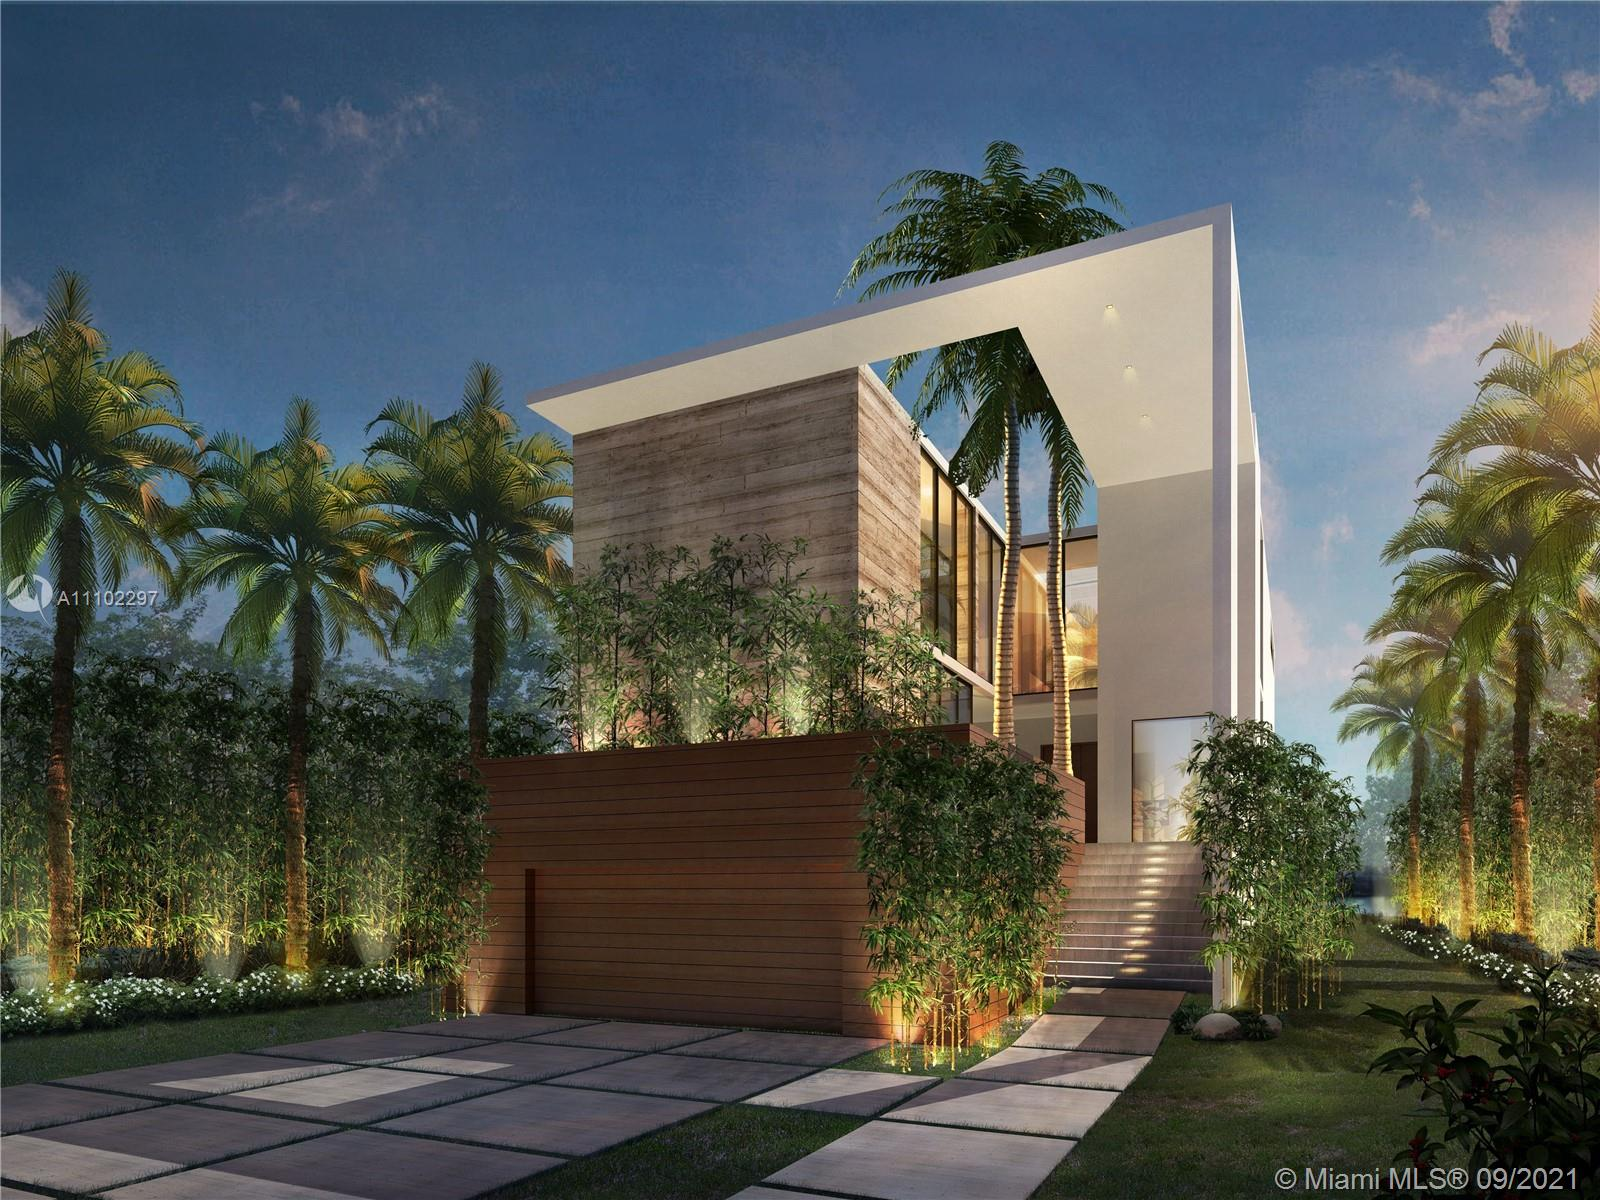 290 S Coconut Ln Luxury Real Estate